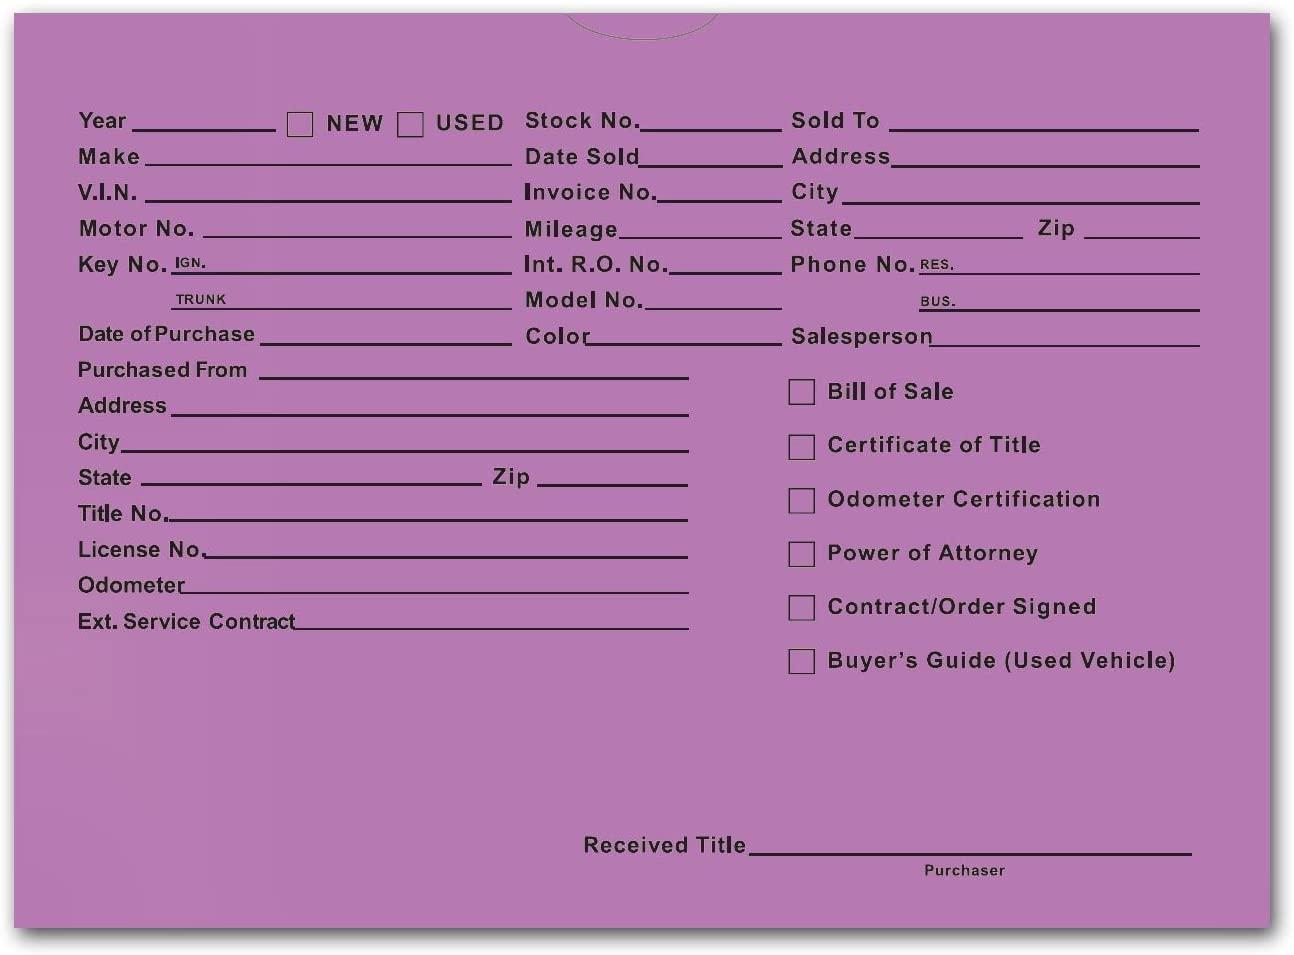 Printed Vehicle Deal Envelopes 9x12 Deal Jackets (100 Shrink Wrapped) (Lavender)